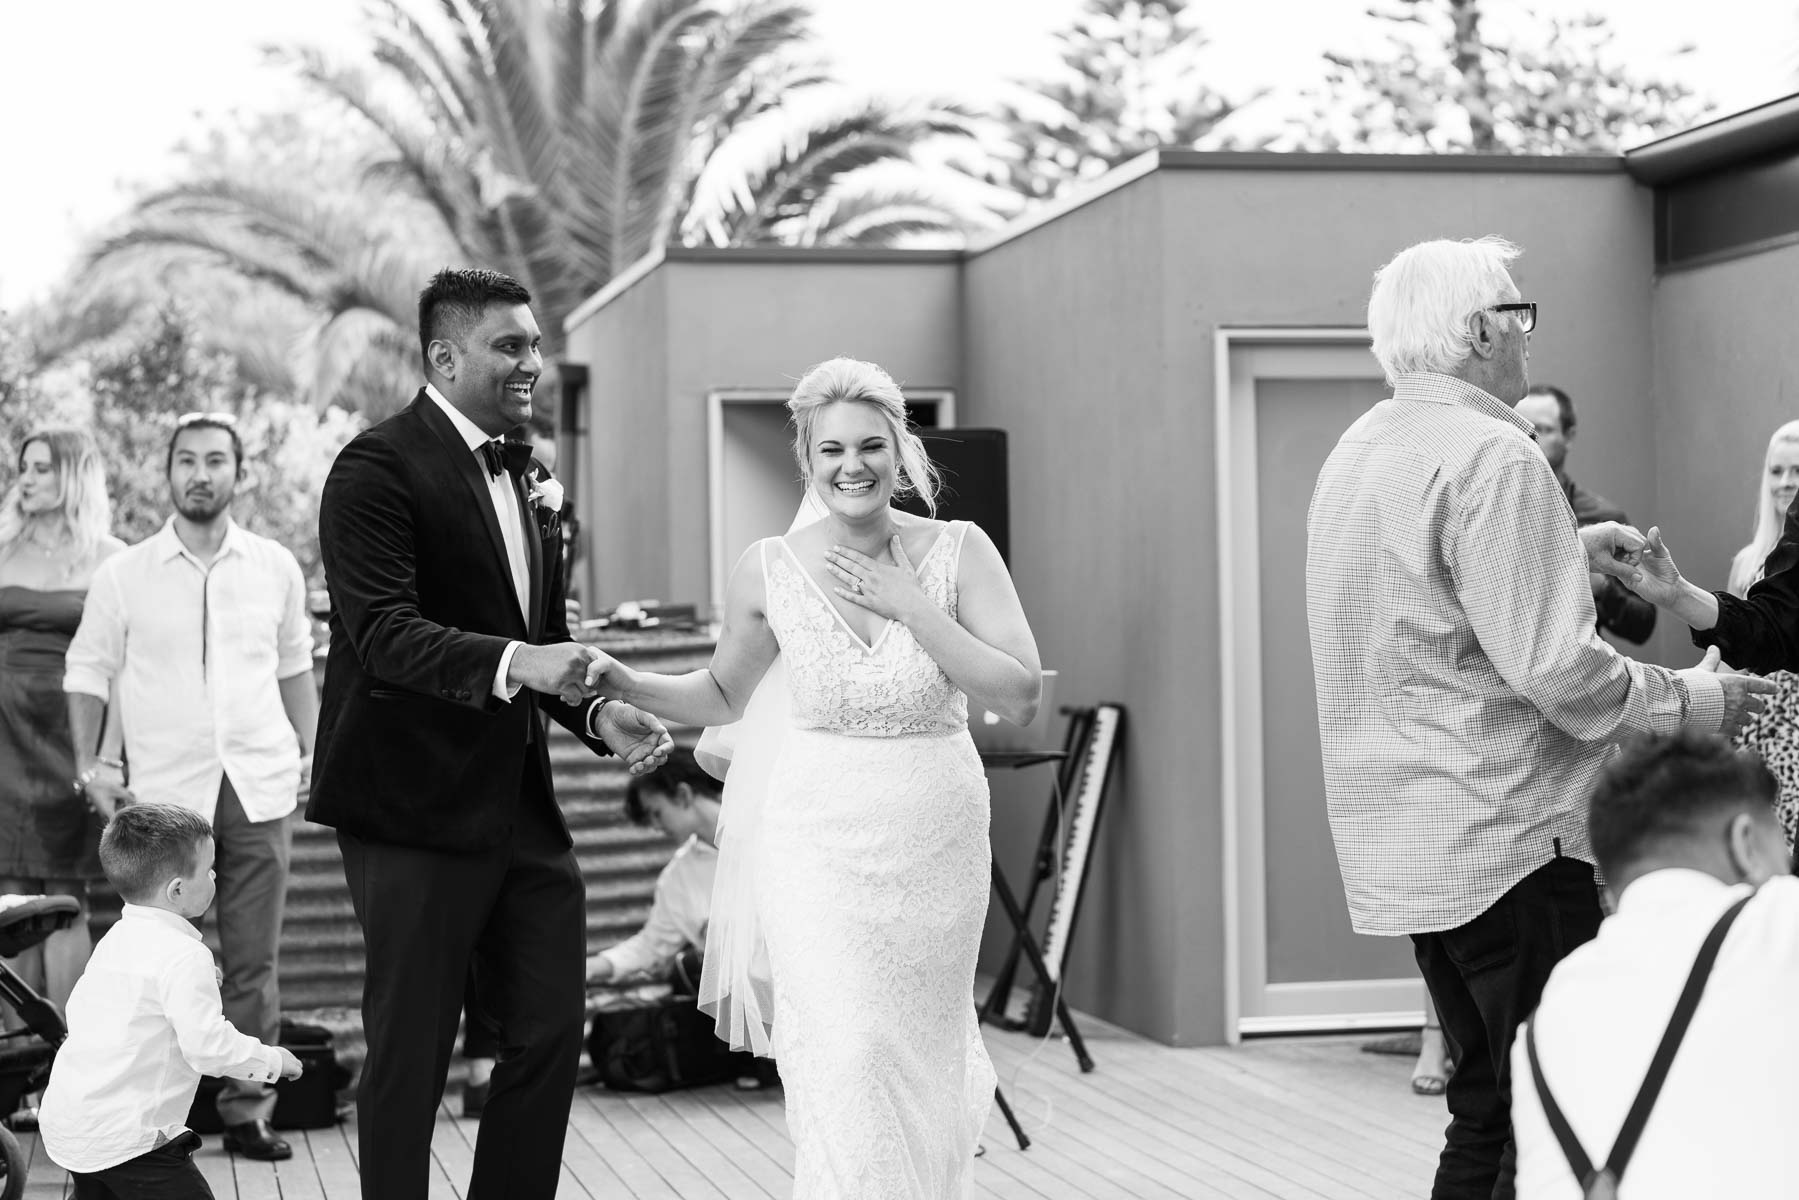 trenavin-chapel-phillip-island-wedding-heart+soul-weddings-sally-sean-01180.jpg